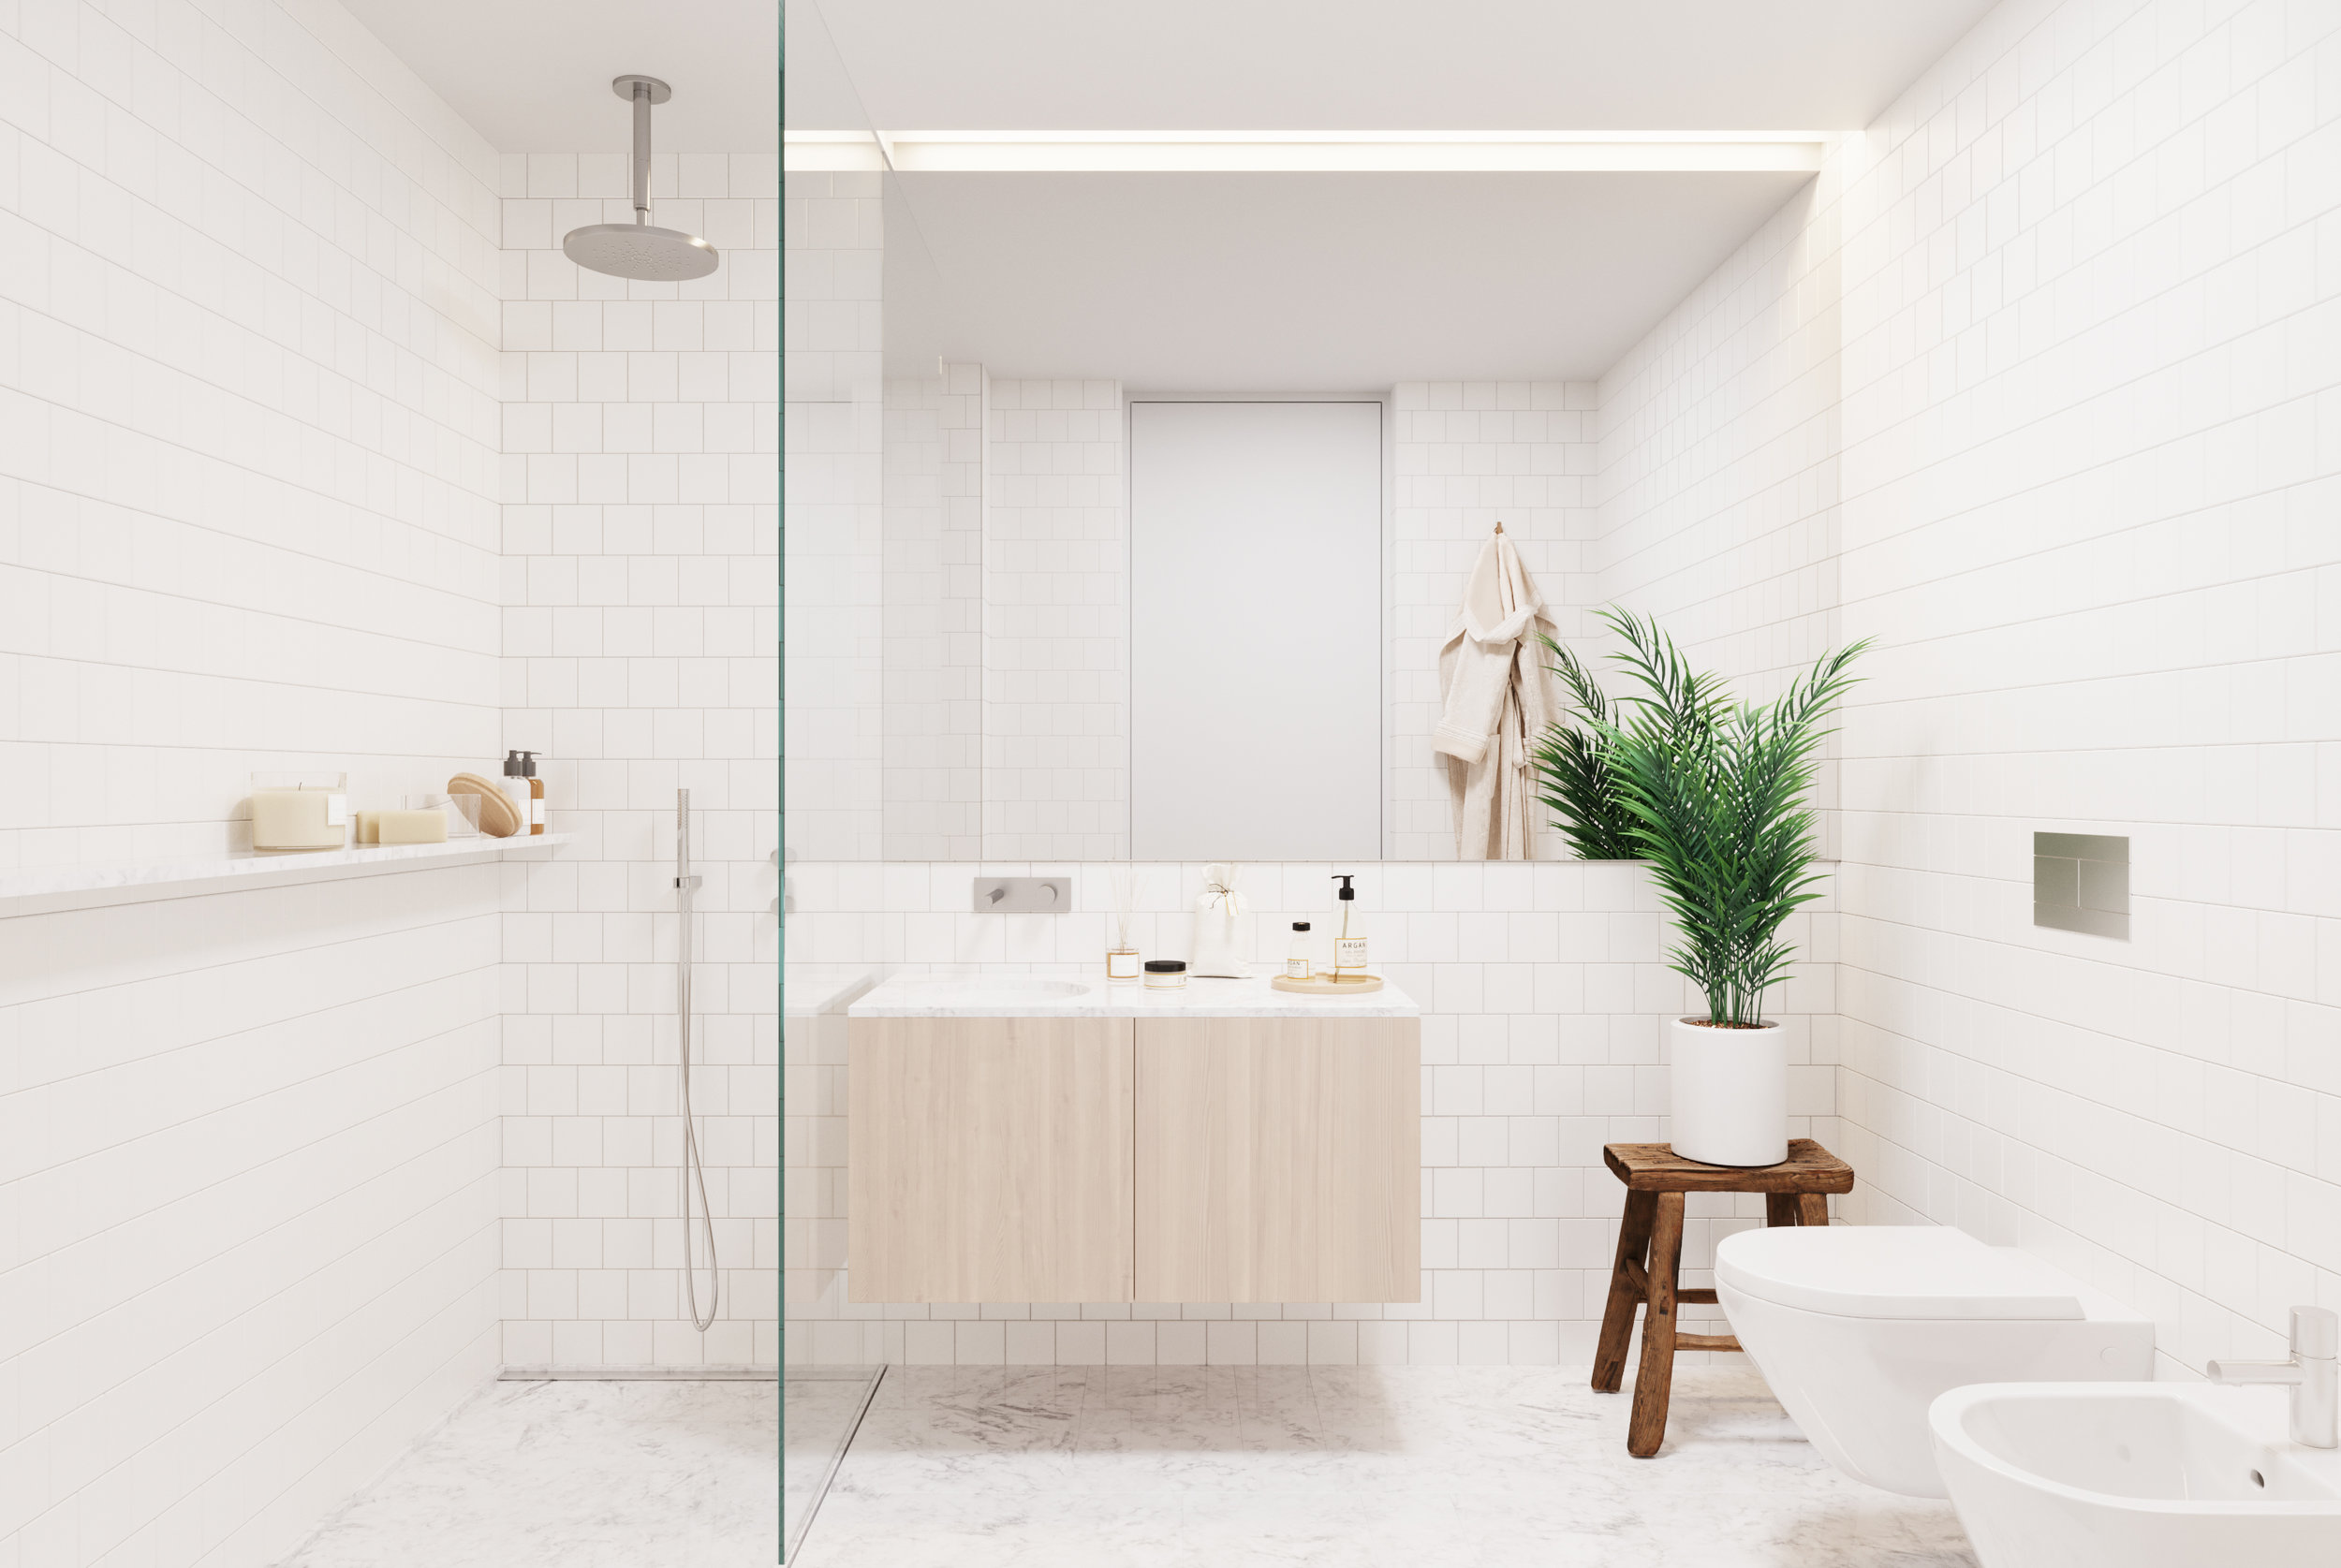 Cardiff 28 - Bathroom.jpg